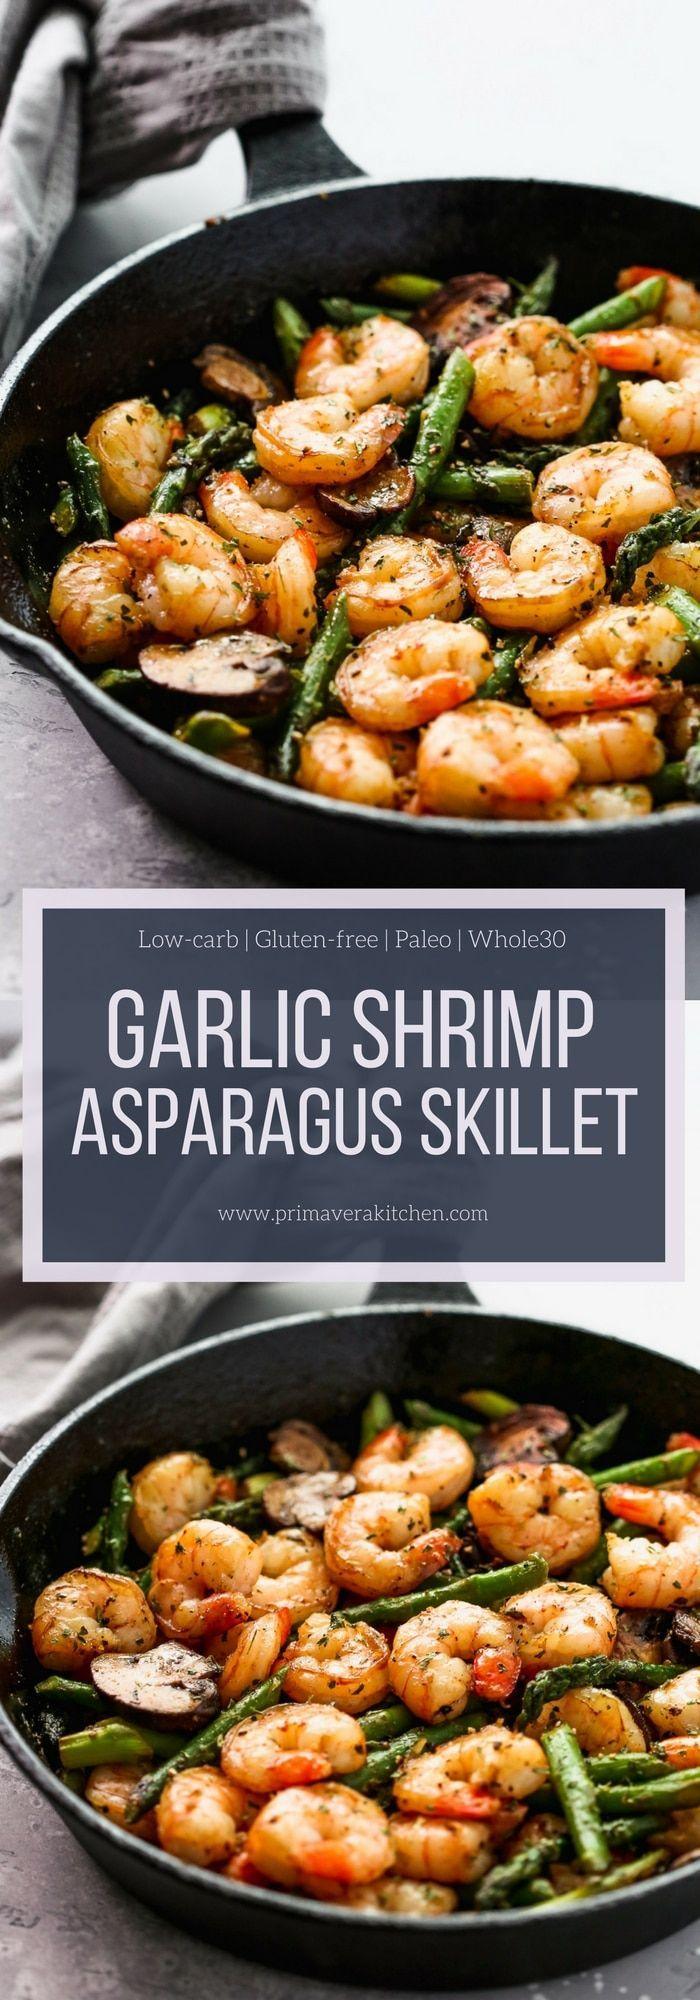 Garlic Shrimp Asparagus Skillet  Primavera Kitchenasparagus Garlic Shrimp Asparagus Skillet Primavera Kitchen Recipe